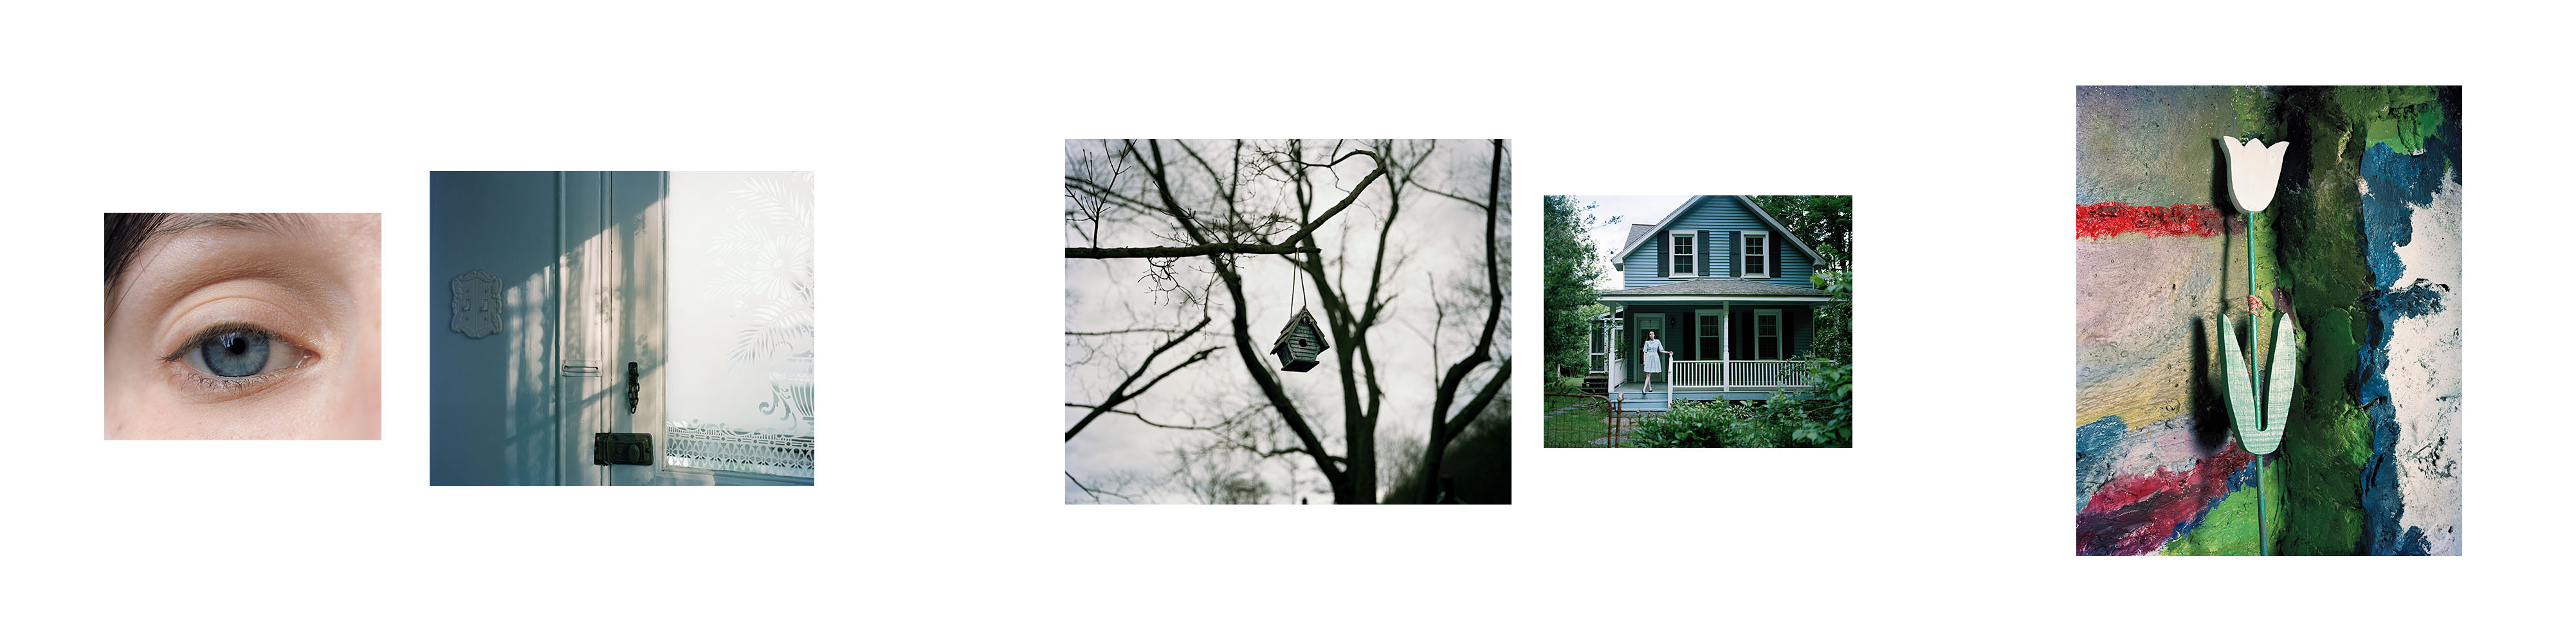 Untitled-01-1